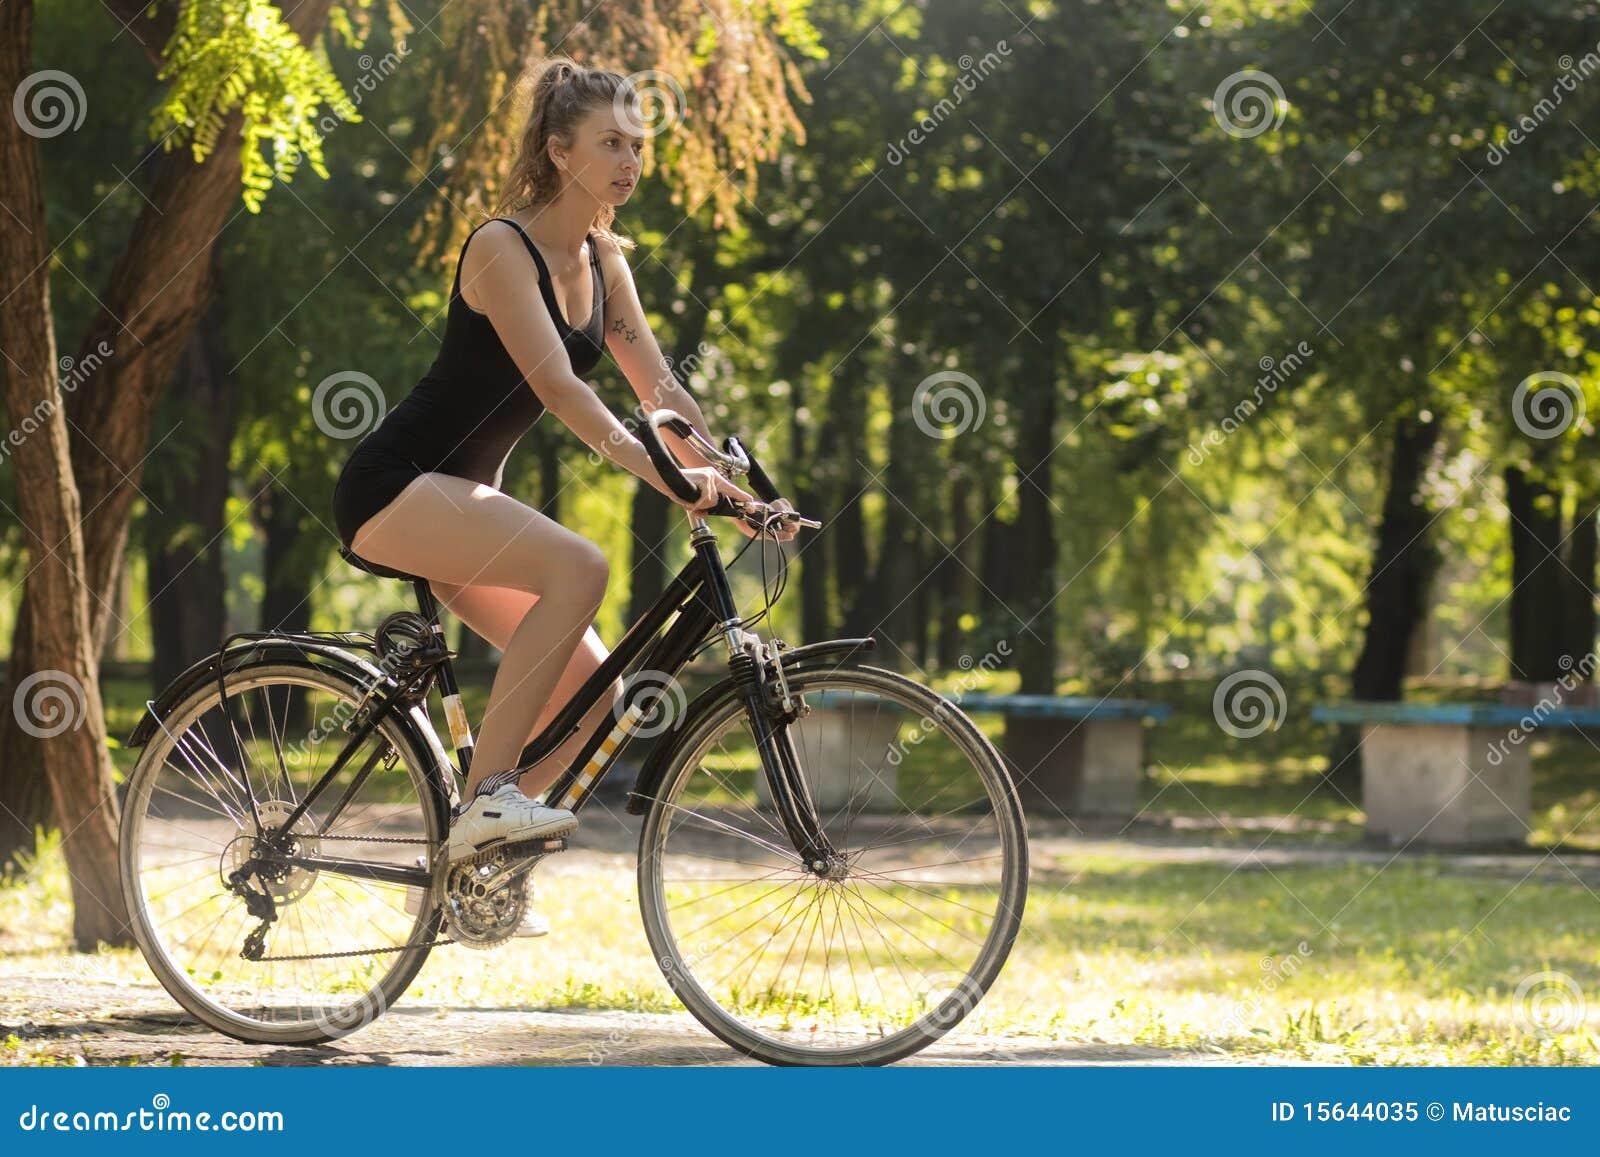 jamaican girls ridding bikes